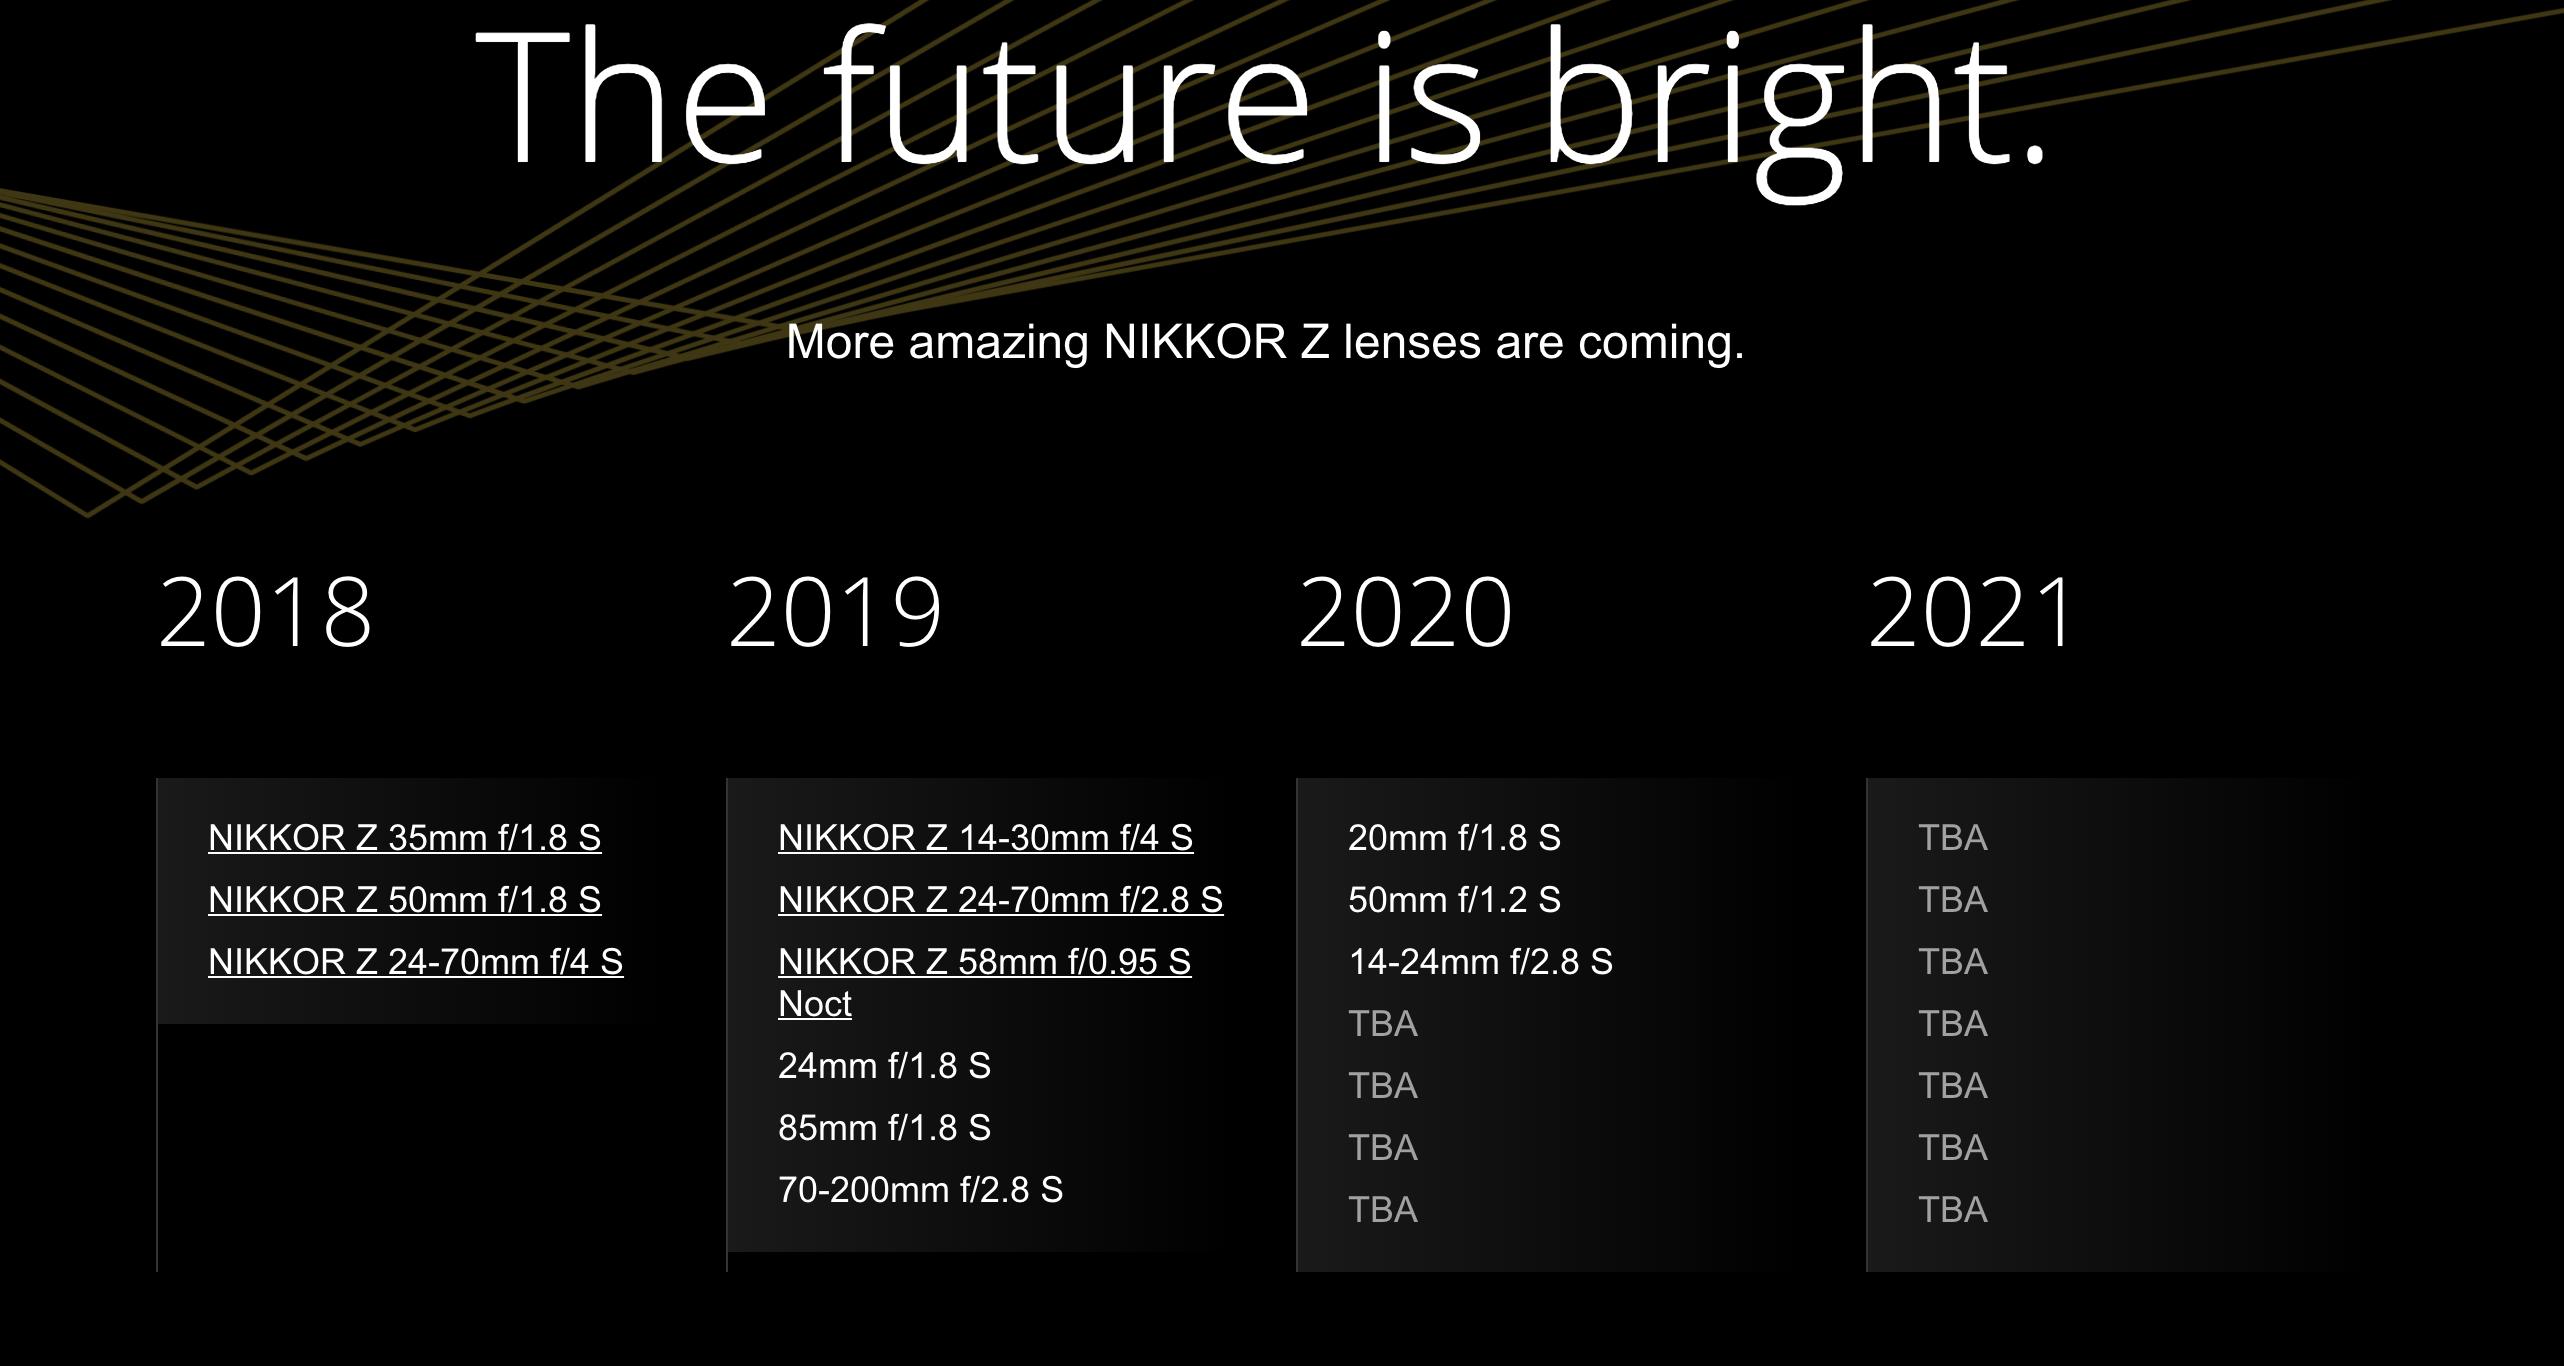 Nikon Z6 and Z7 Eye Autofocus Tests Reveal Struggles with